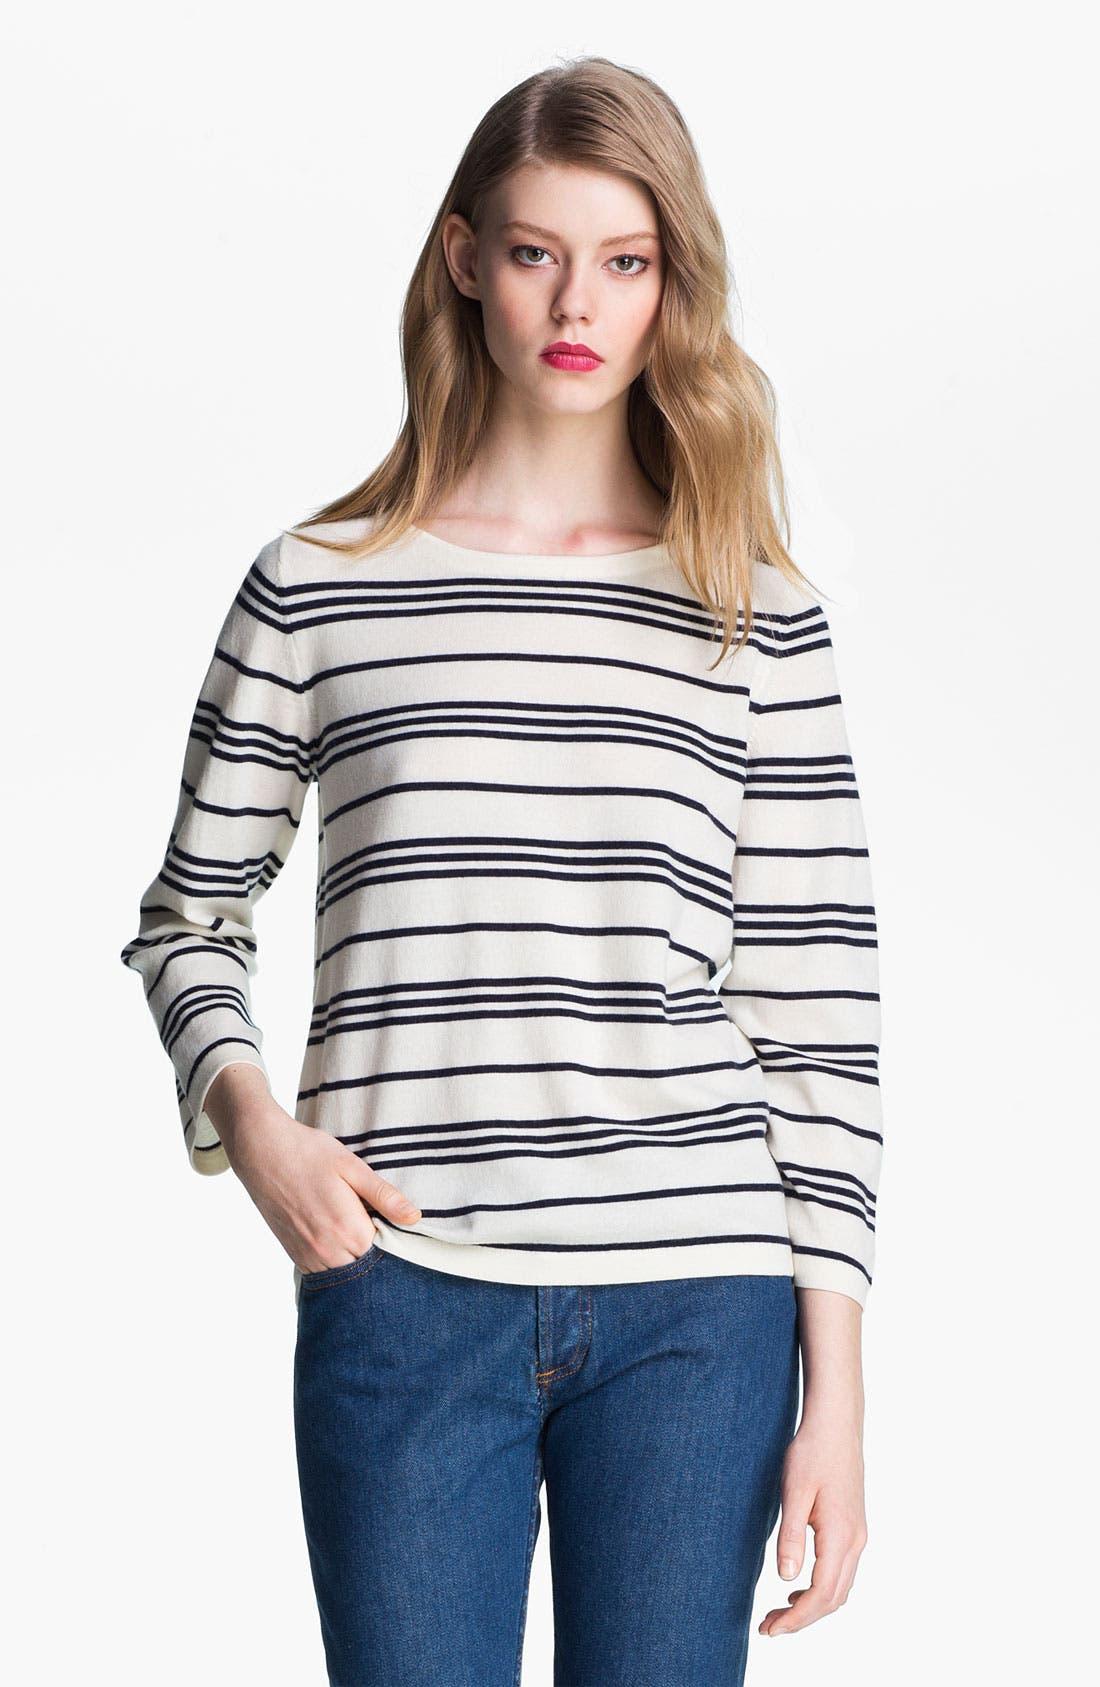 Alternate Image 1 Selected - A.P.C. Marinière Stripe Wool Sweater